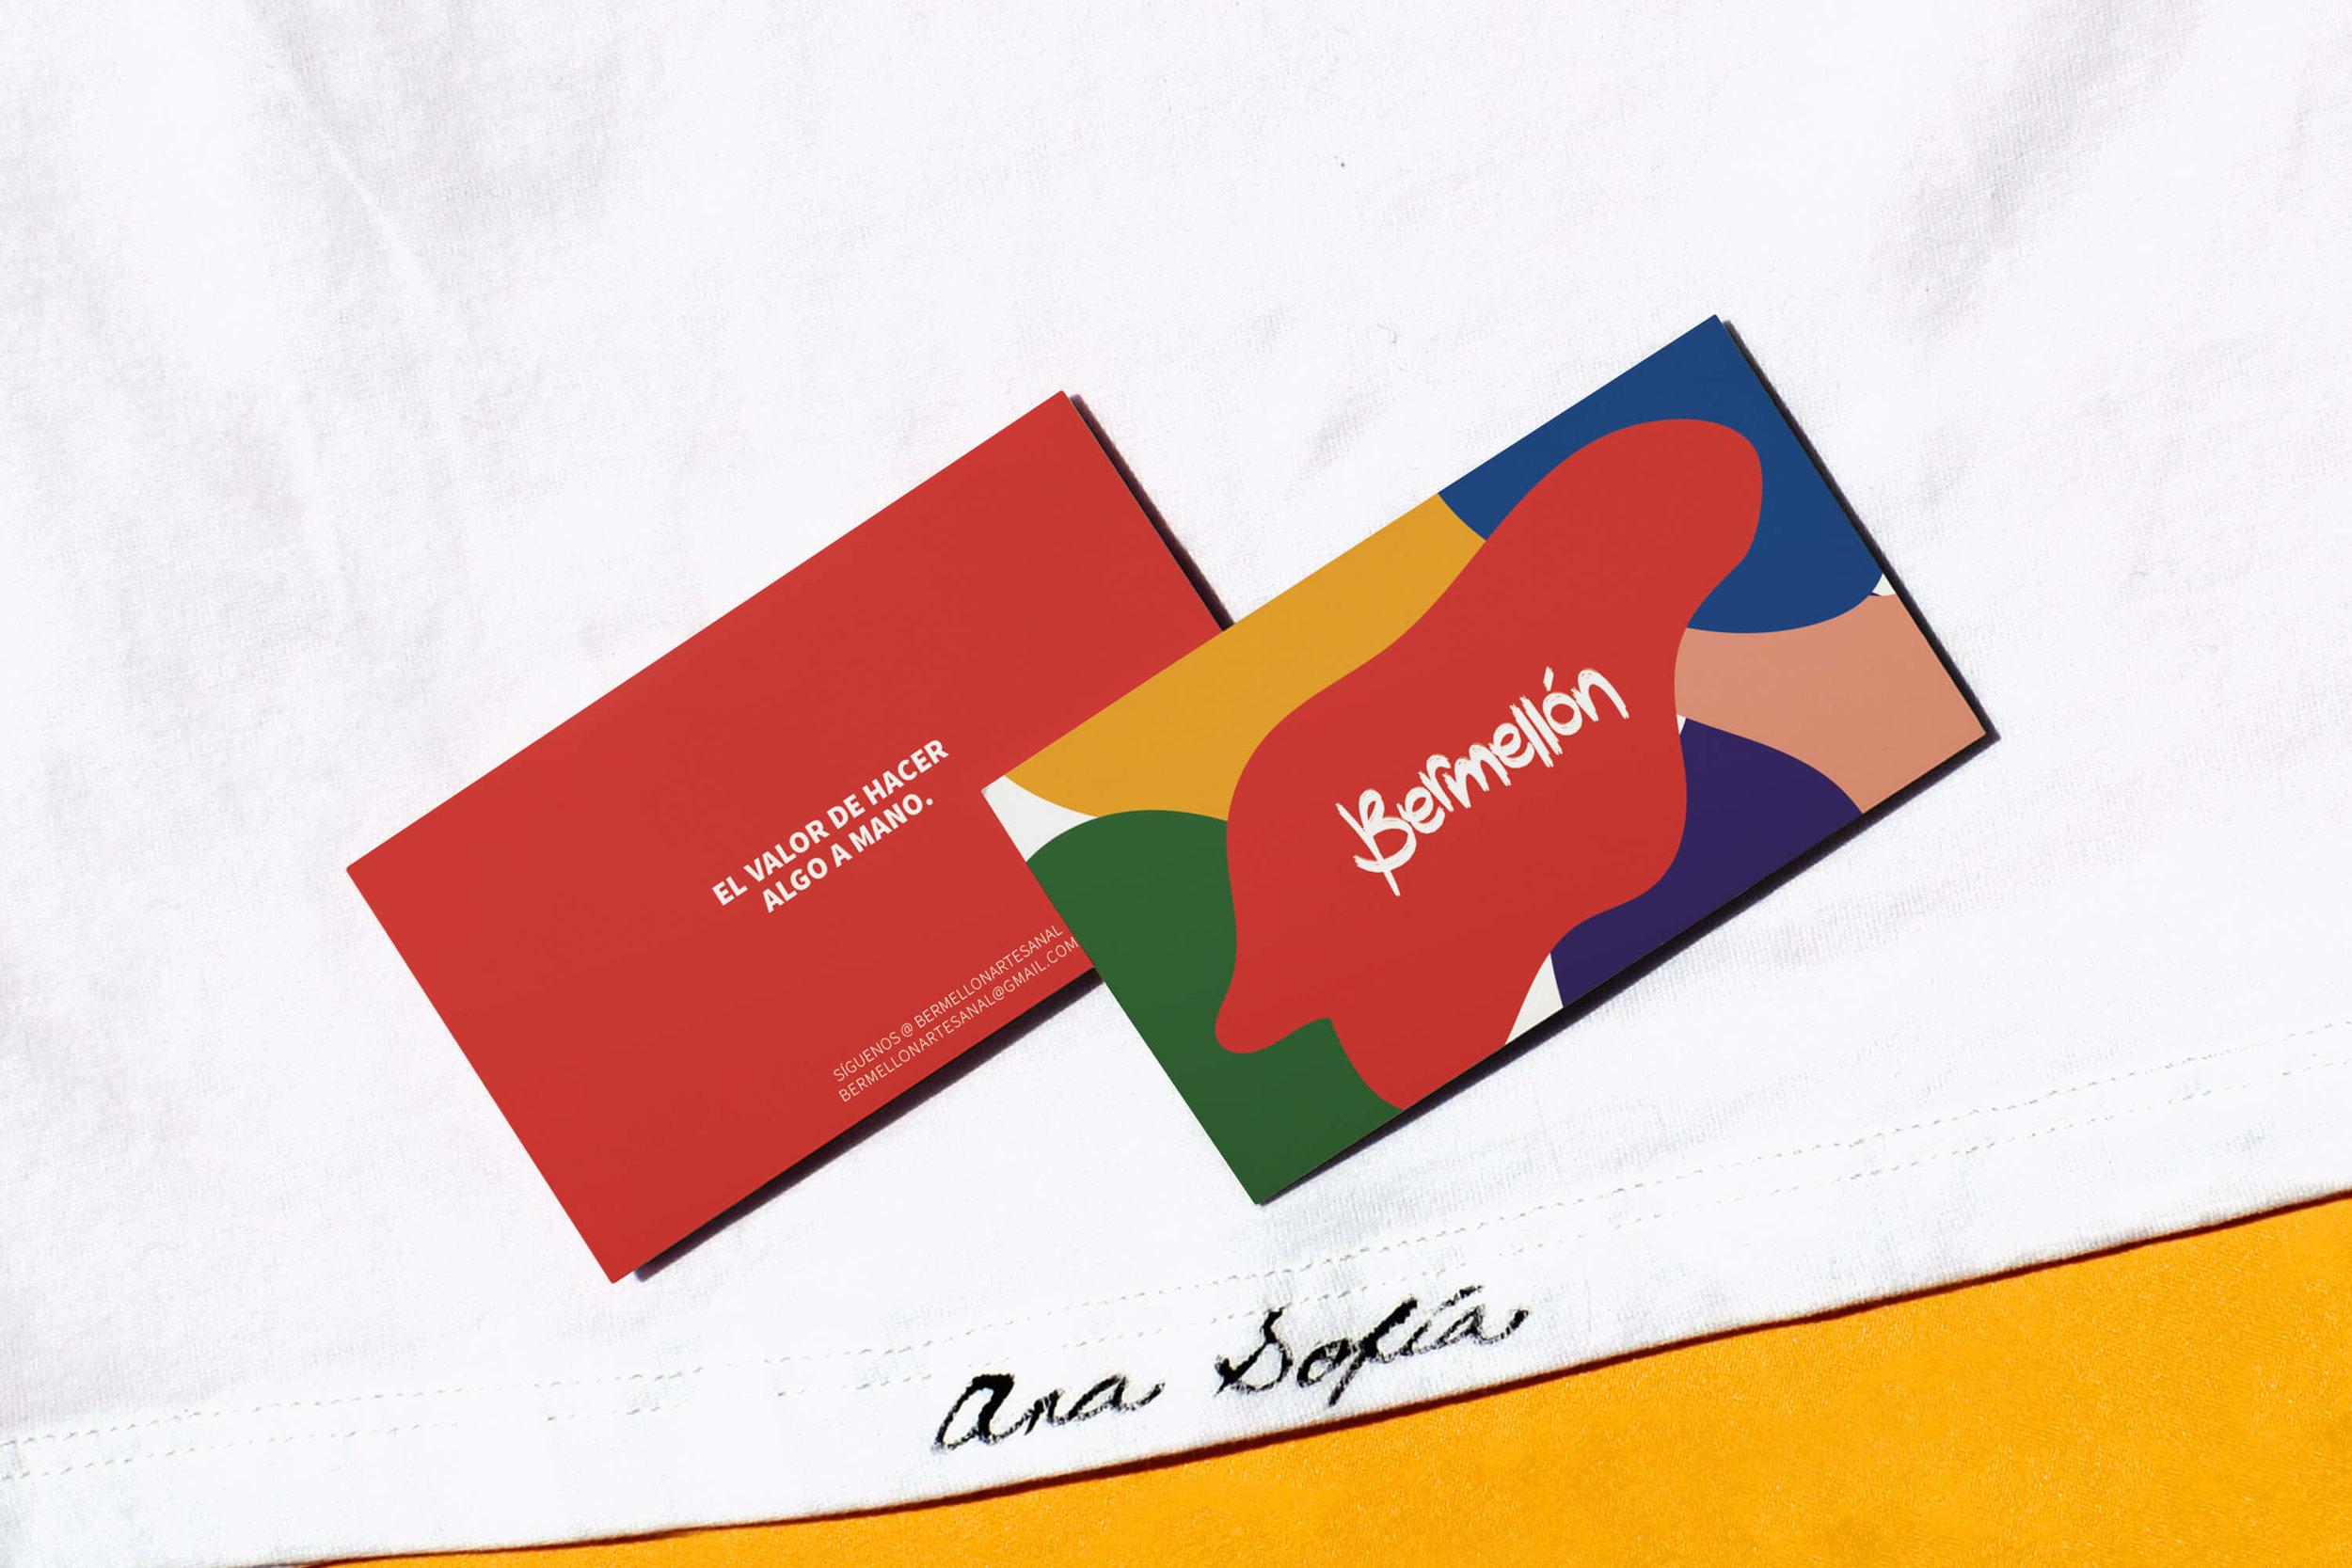 logo-design-branding-san-diego-vortic-bermellon-11-2